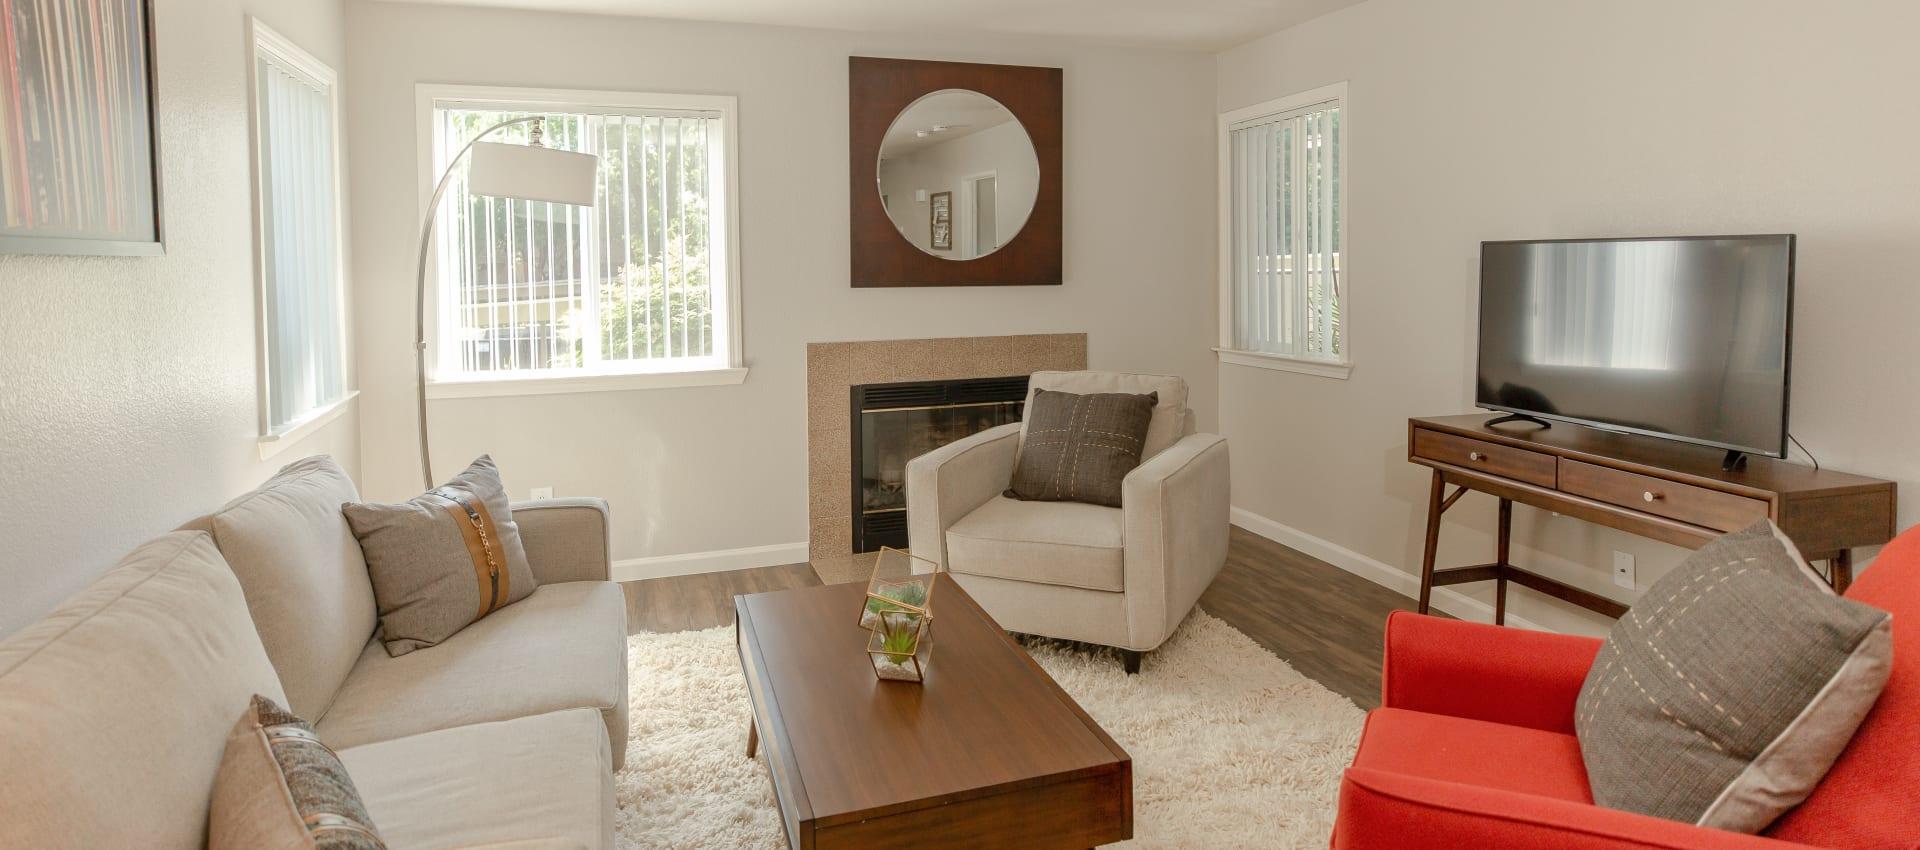 Living room at Shaliko in Rocklin, California.